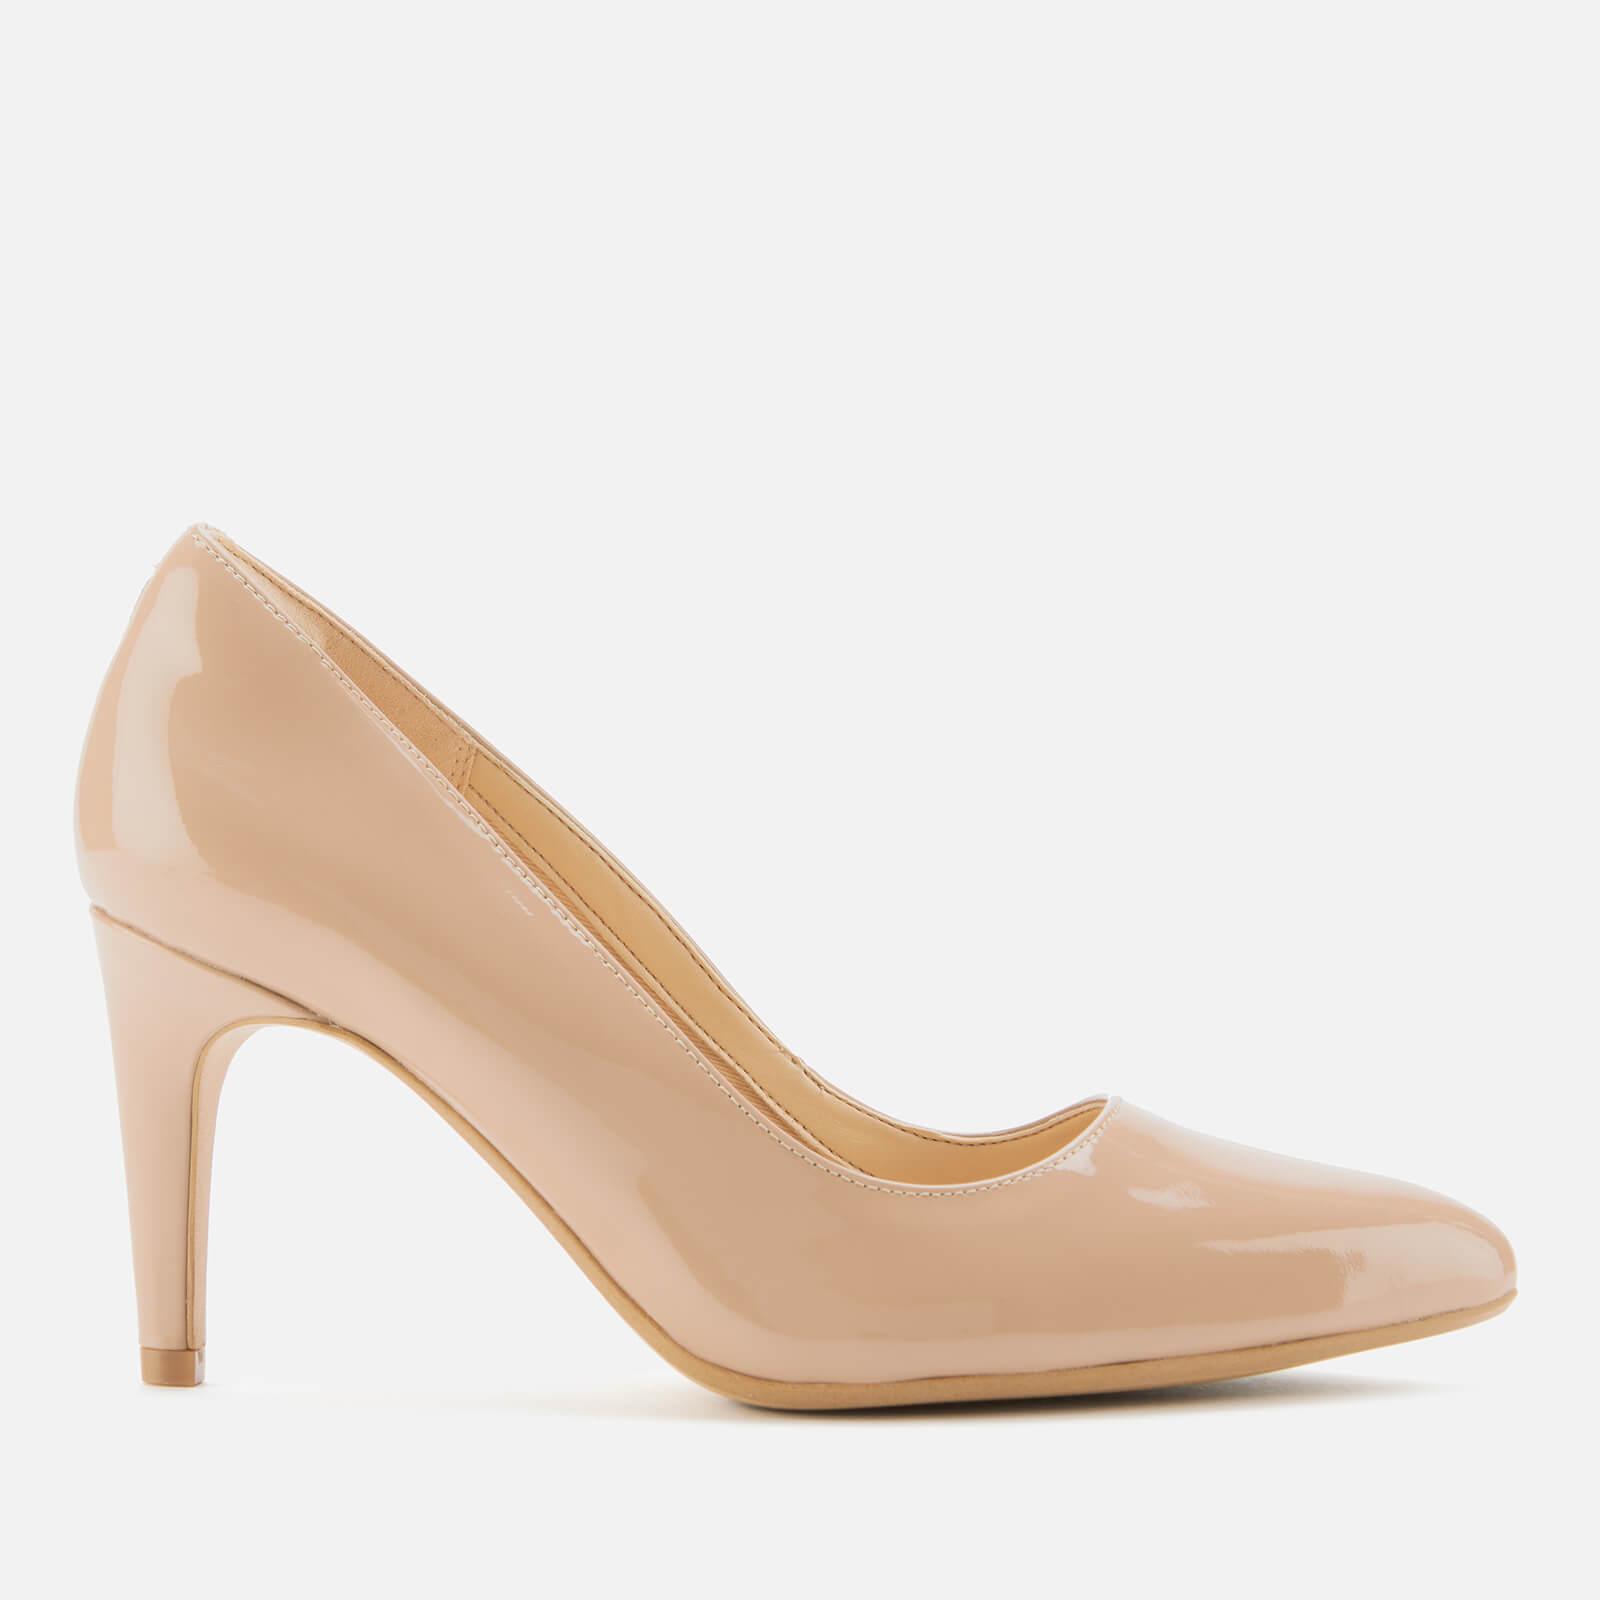 Clarks Women's Laina Rae Patent Court Shoes - Praline - UK 8